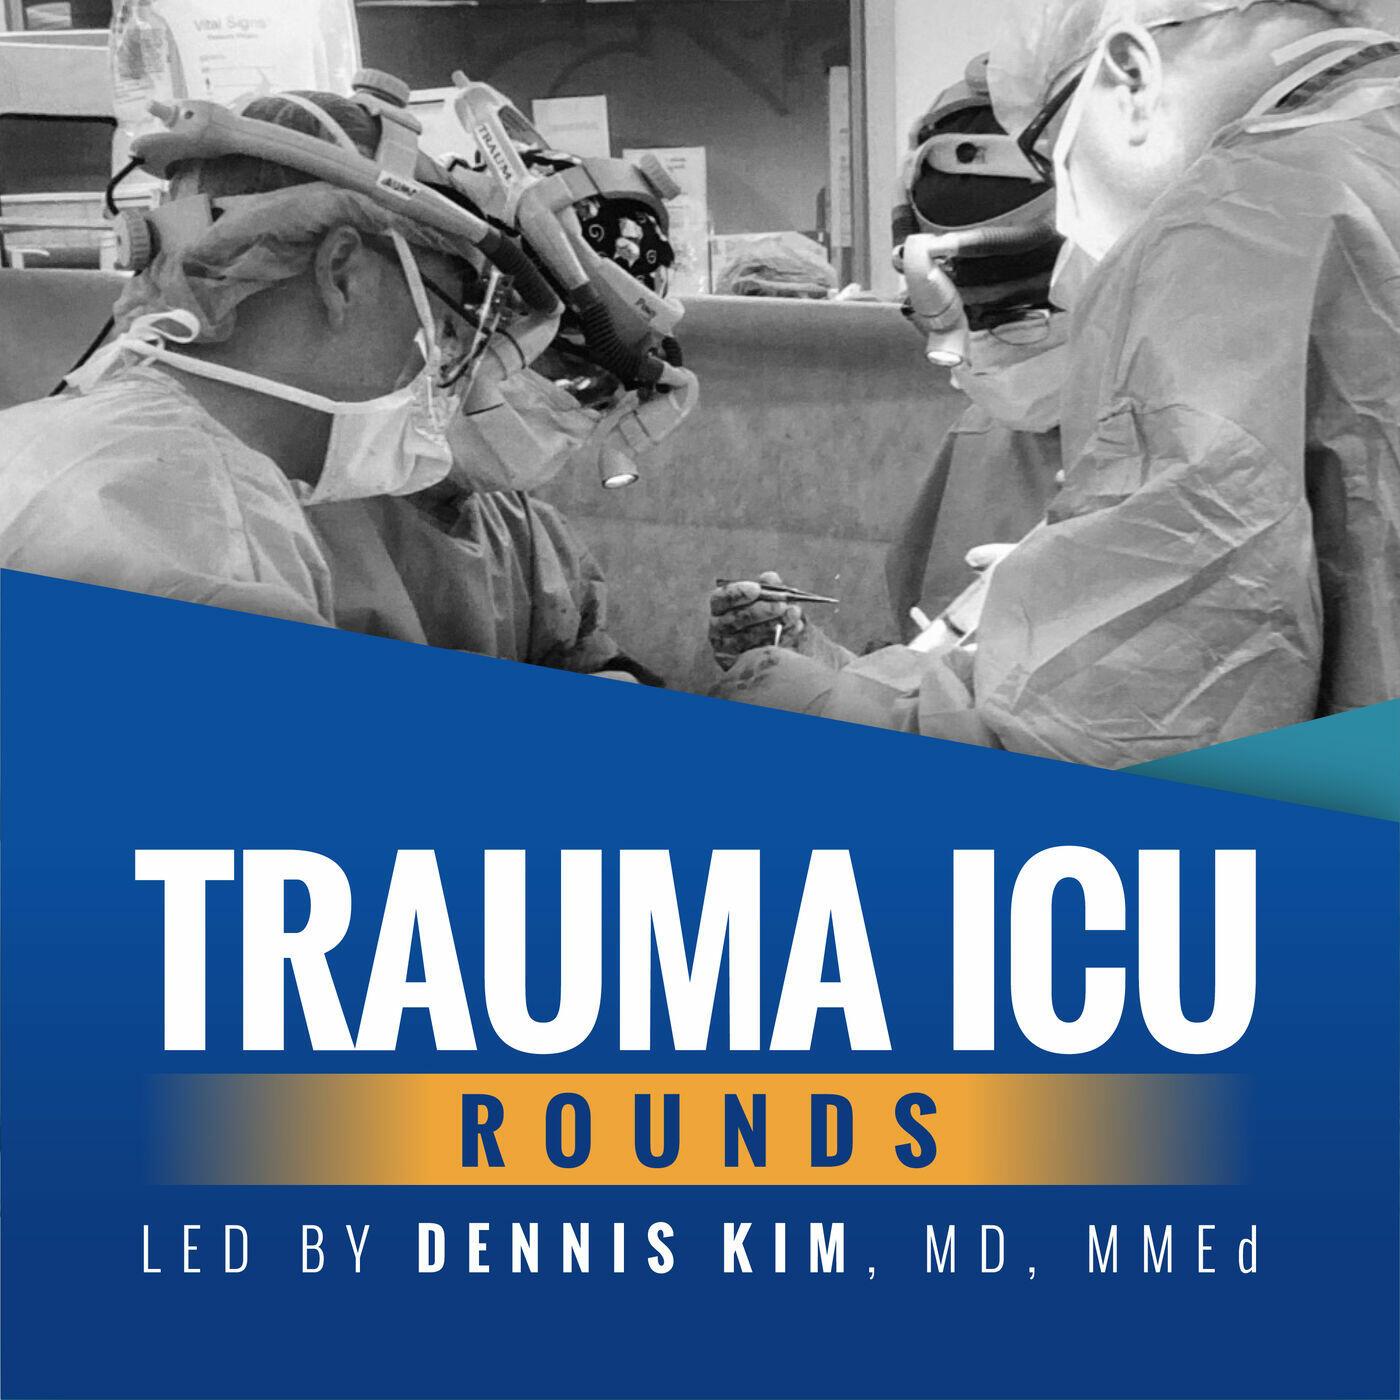 Trauma ICU Rounds